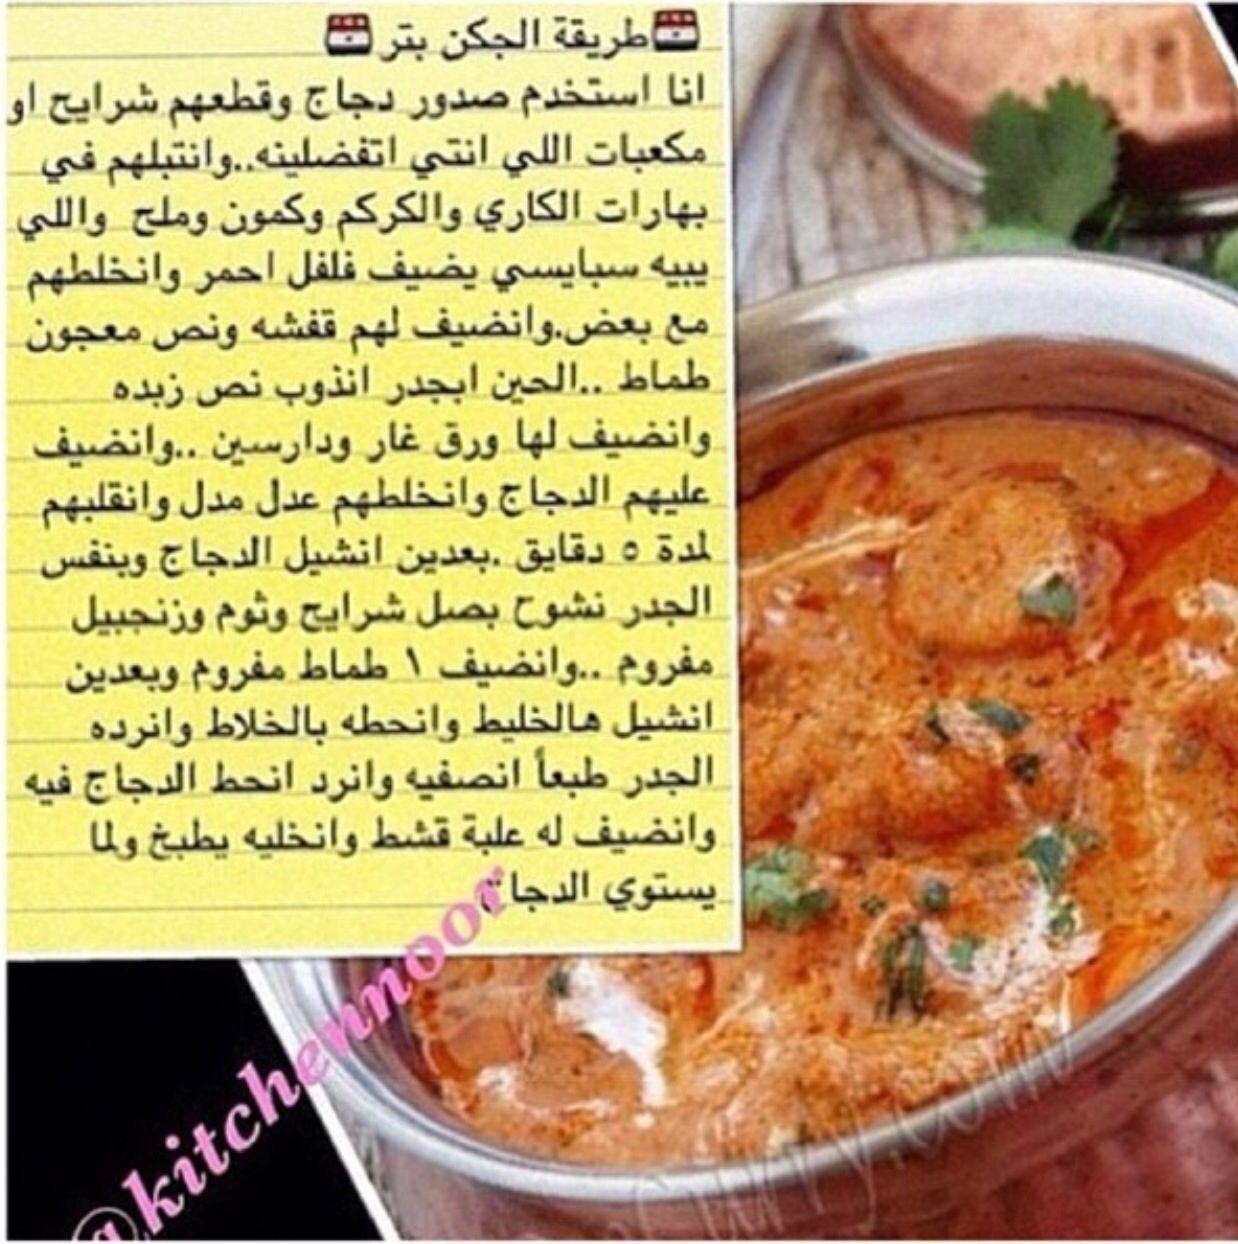 جكن بتر تم التطبيق Food Receipes Cookout Food Cooking Recipes